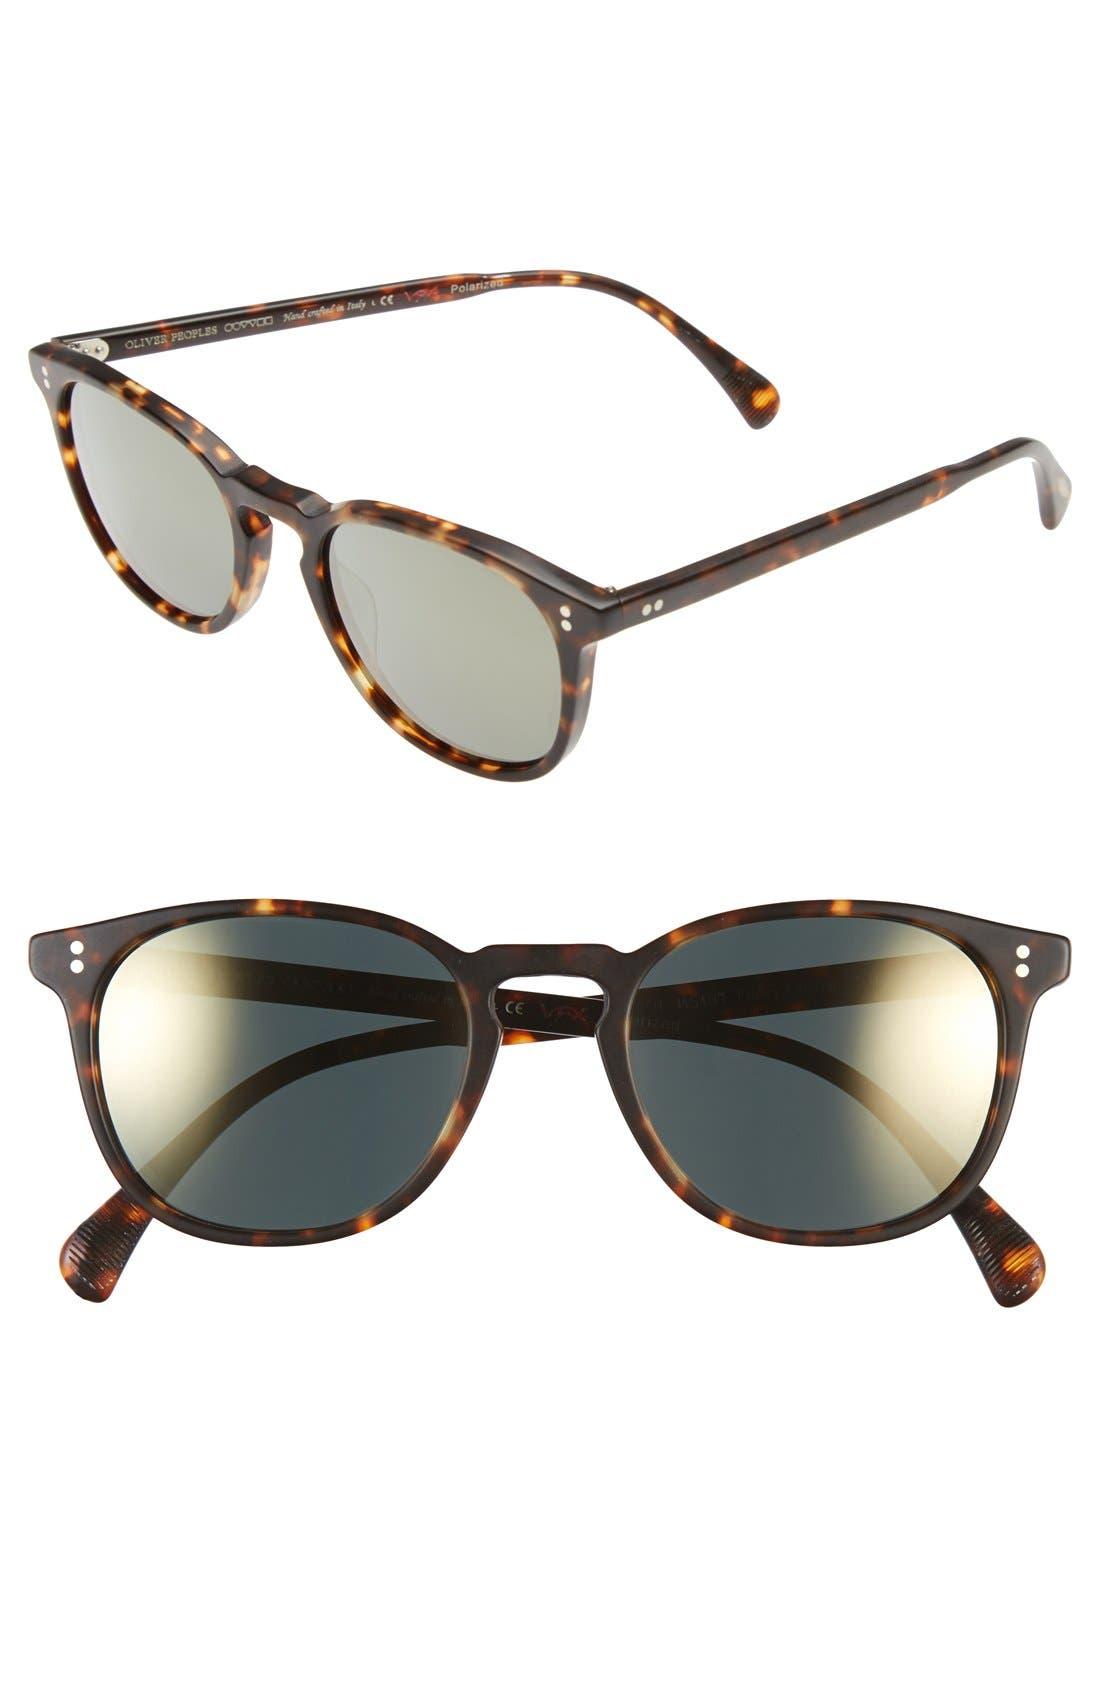 'Finley' 51mm Polarized Sunglasses,                         Main,                         color, Brown/ Tortoise/ Gold Polar